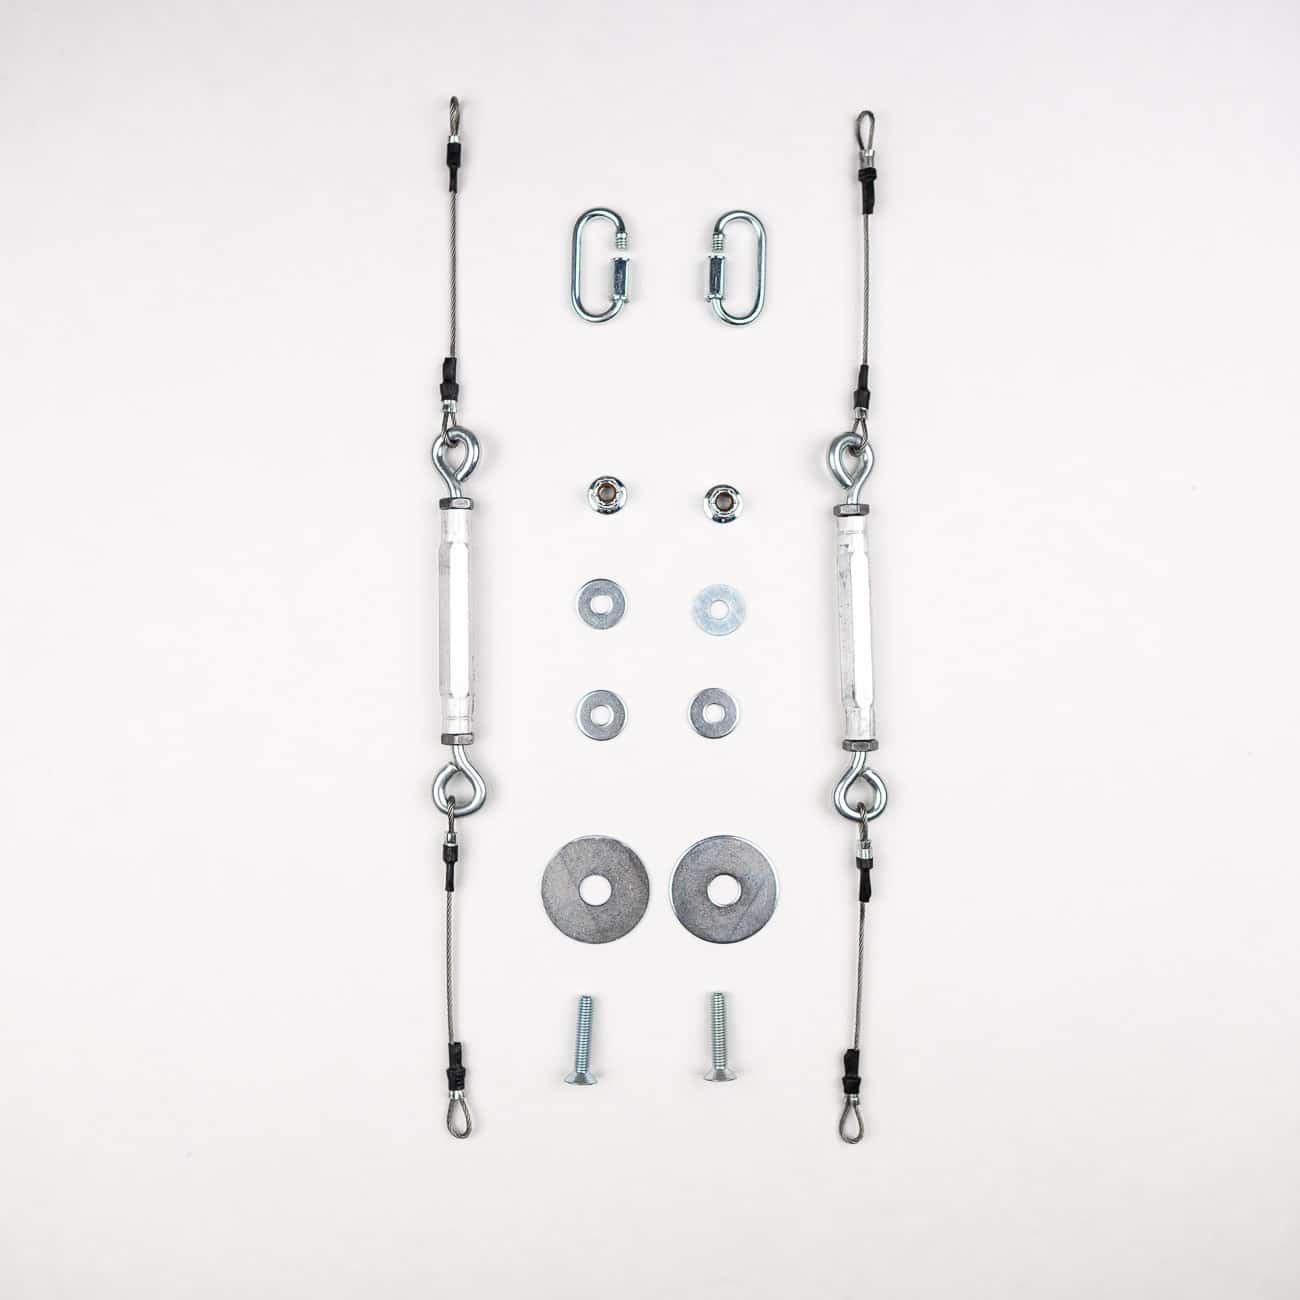 Adjustable Splitter Cable Rods